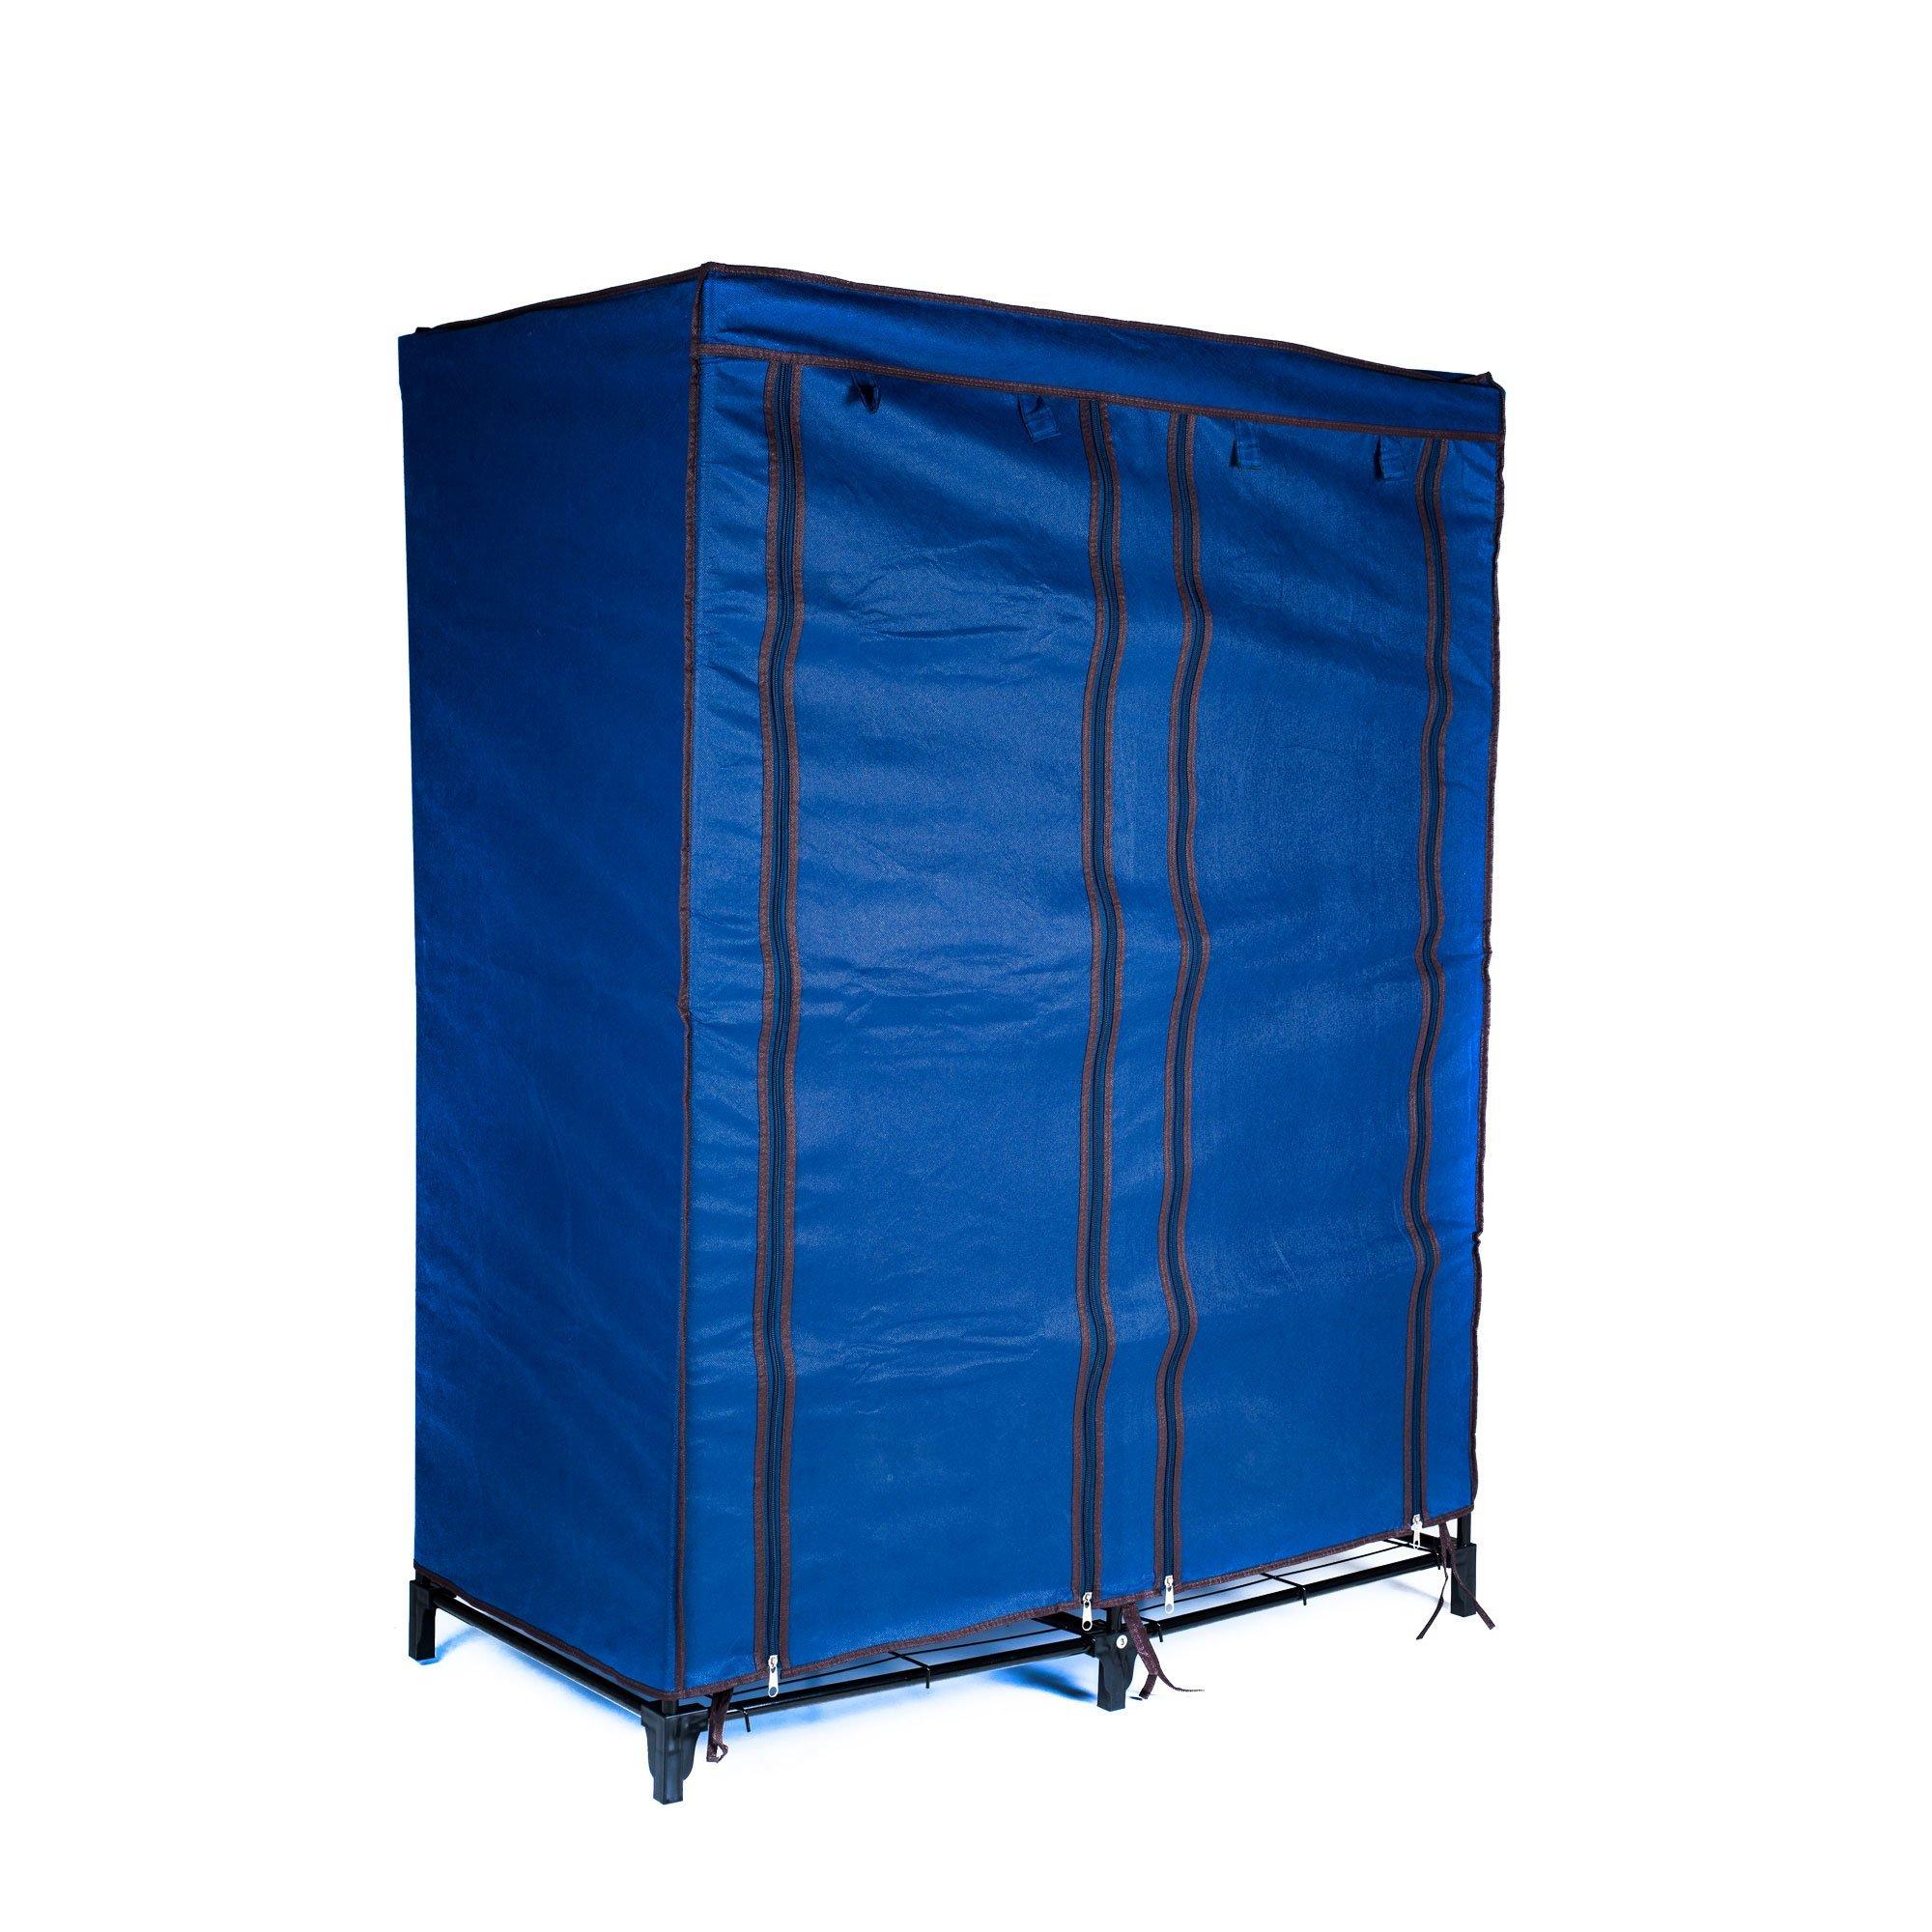 Everyday Home Clothes Closet Portable Wardrobe with Shelves - Blue